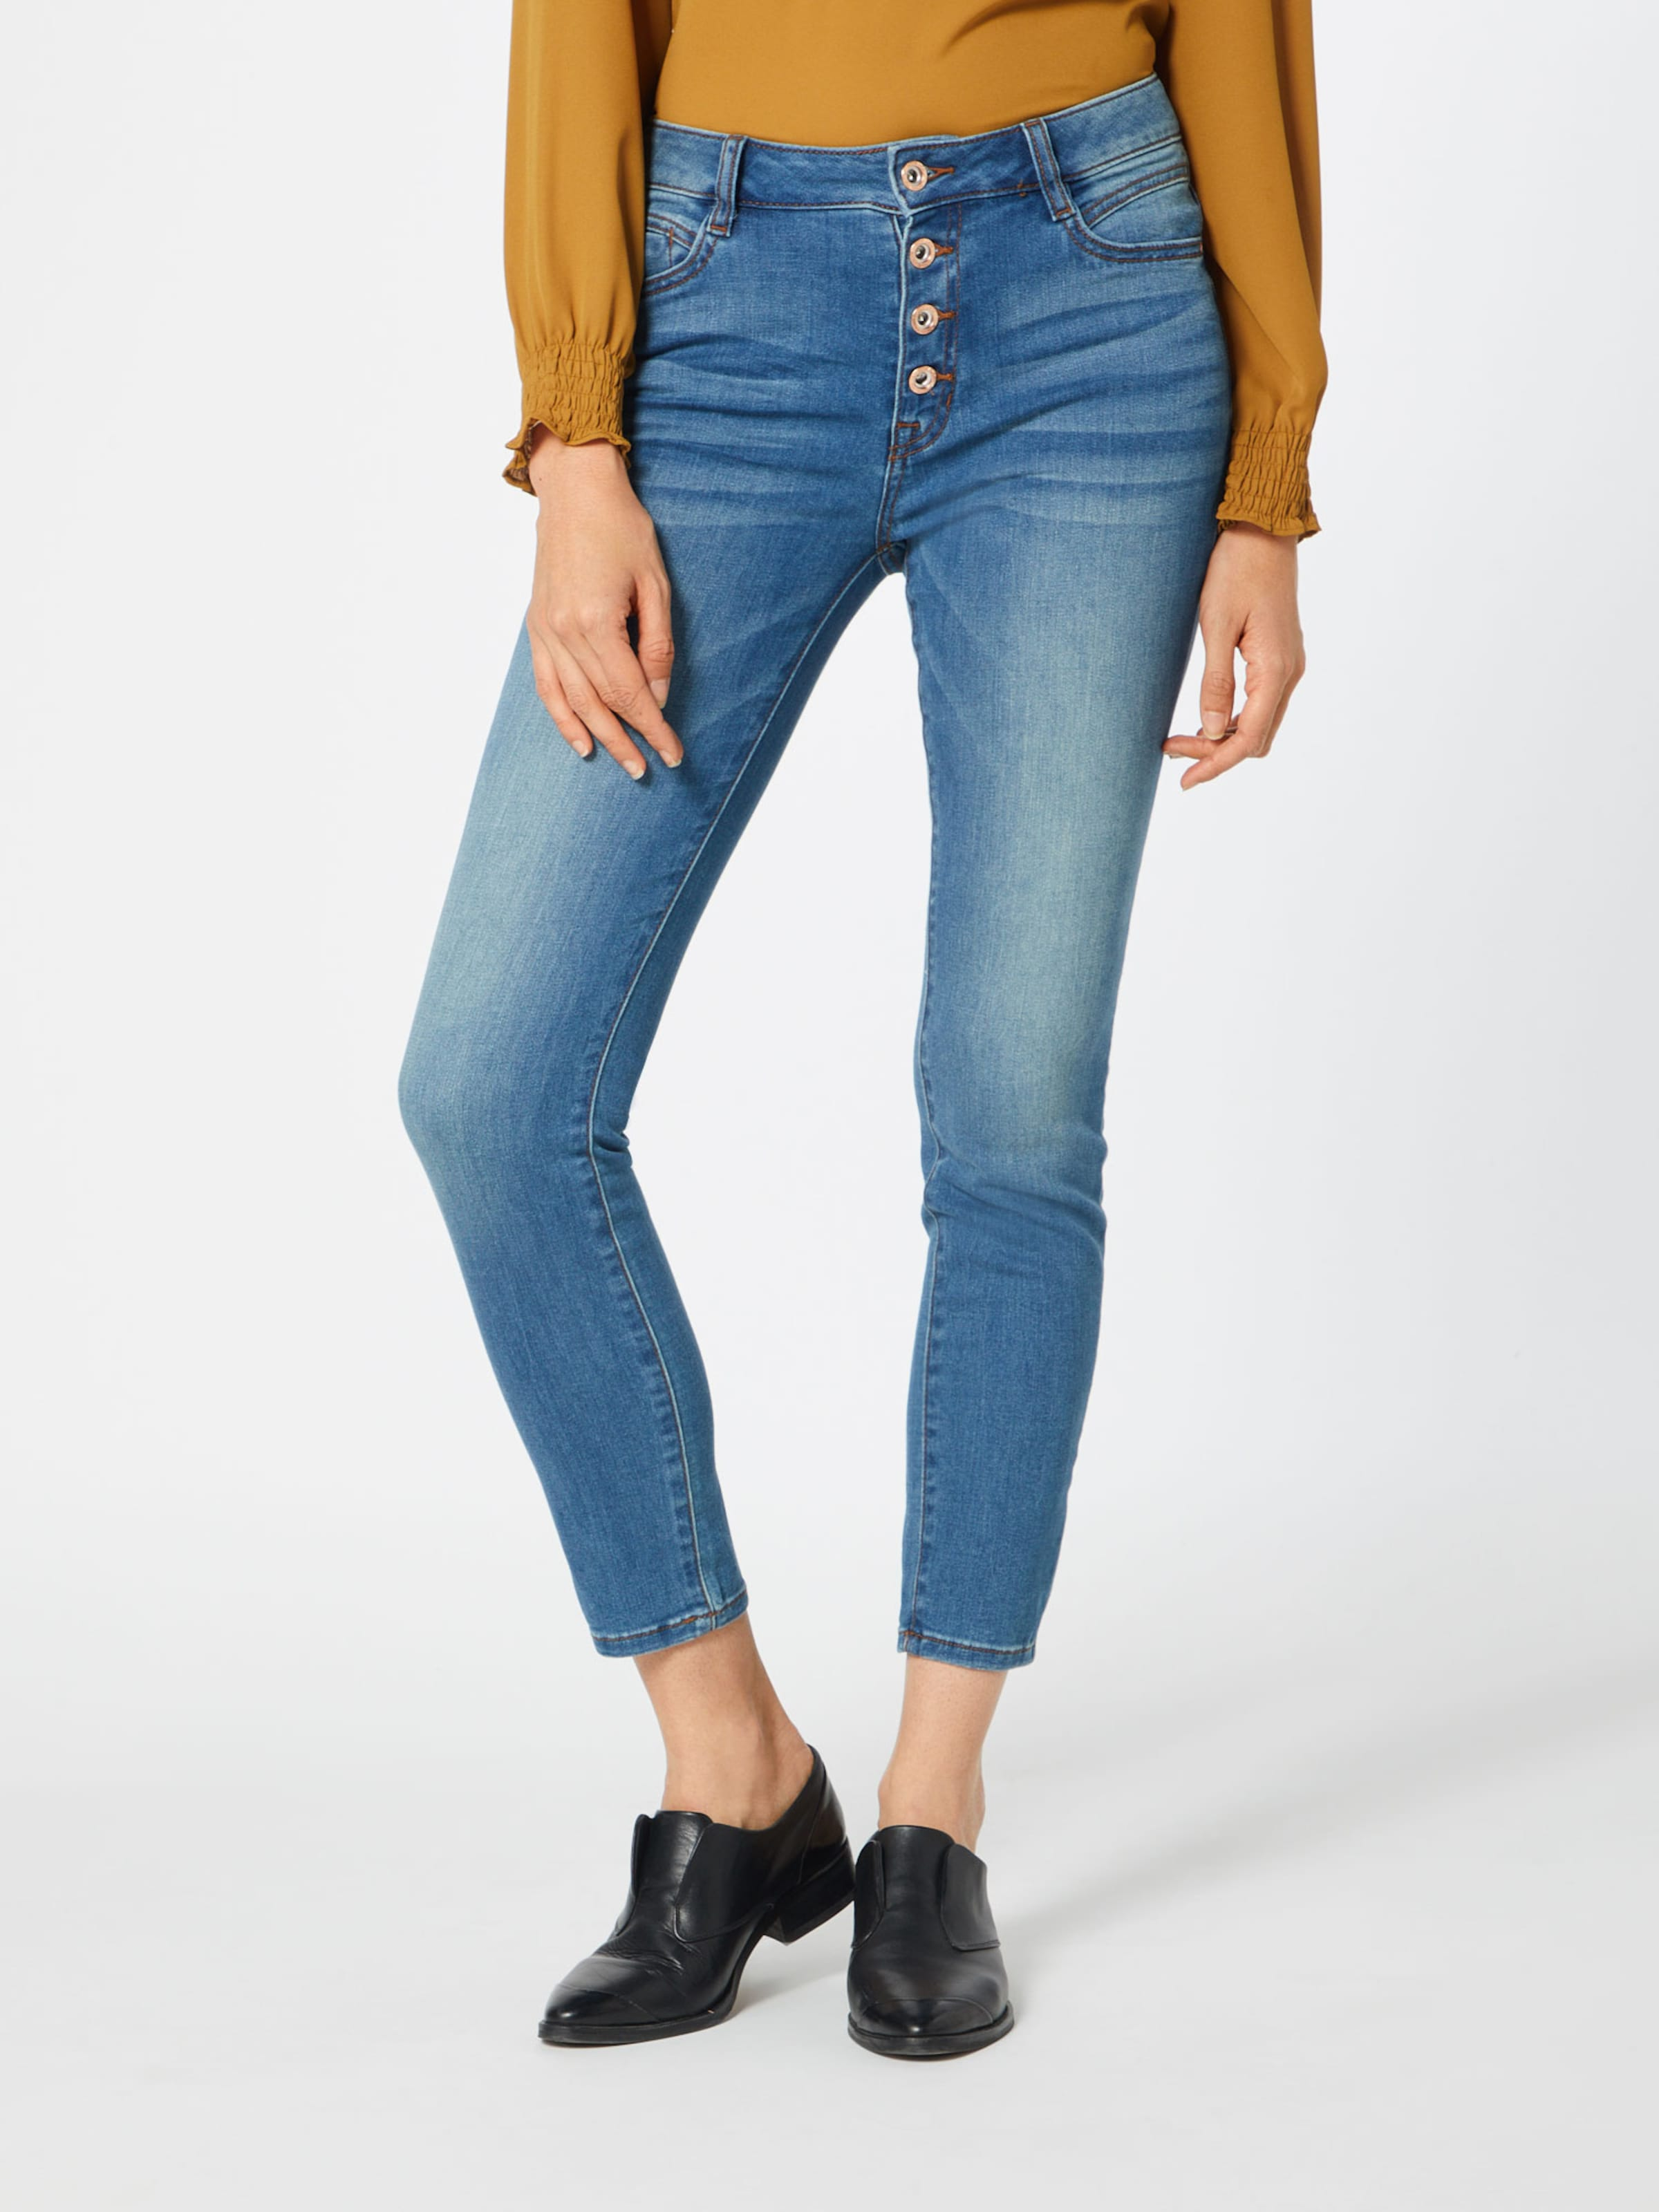 In Tailor Tom Denim Jeans Blue UzqpSMV